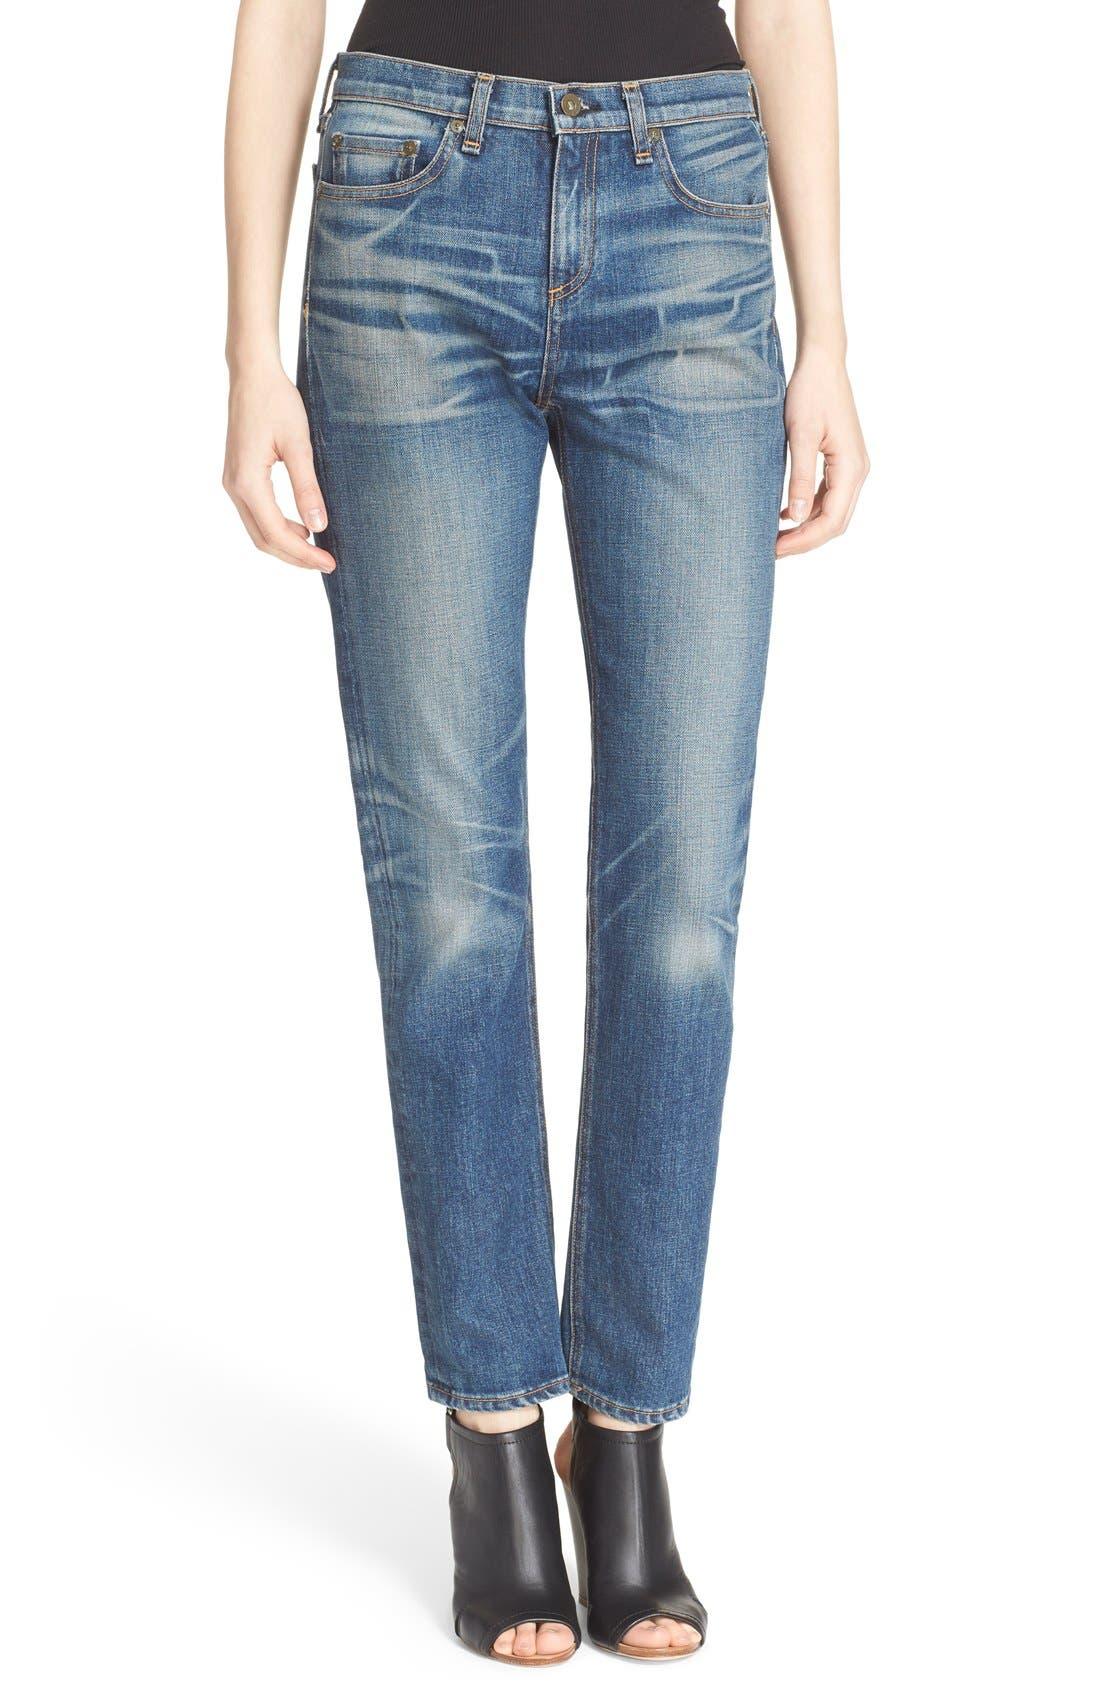 Alternate Image 1 Selected - rag & bone/JEAN 'Dre' High Rise Boyfriend Skinny Jeans (Exeter)